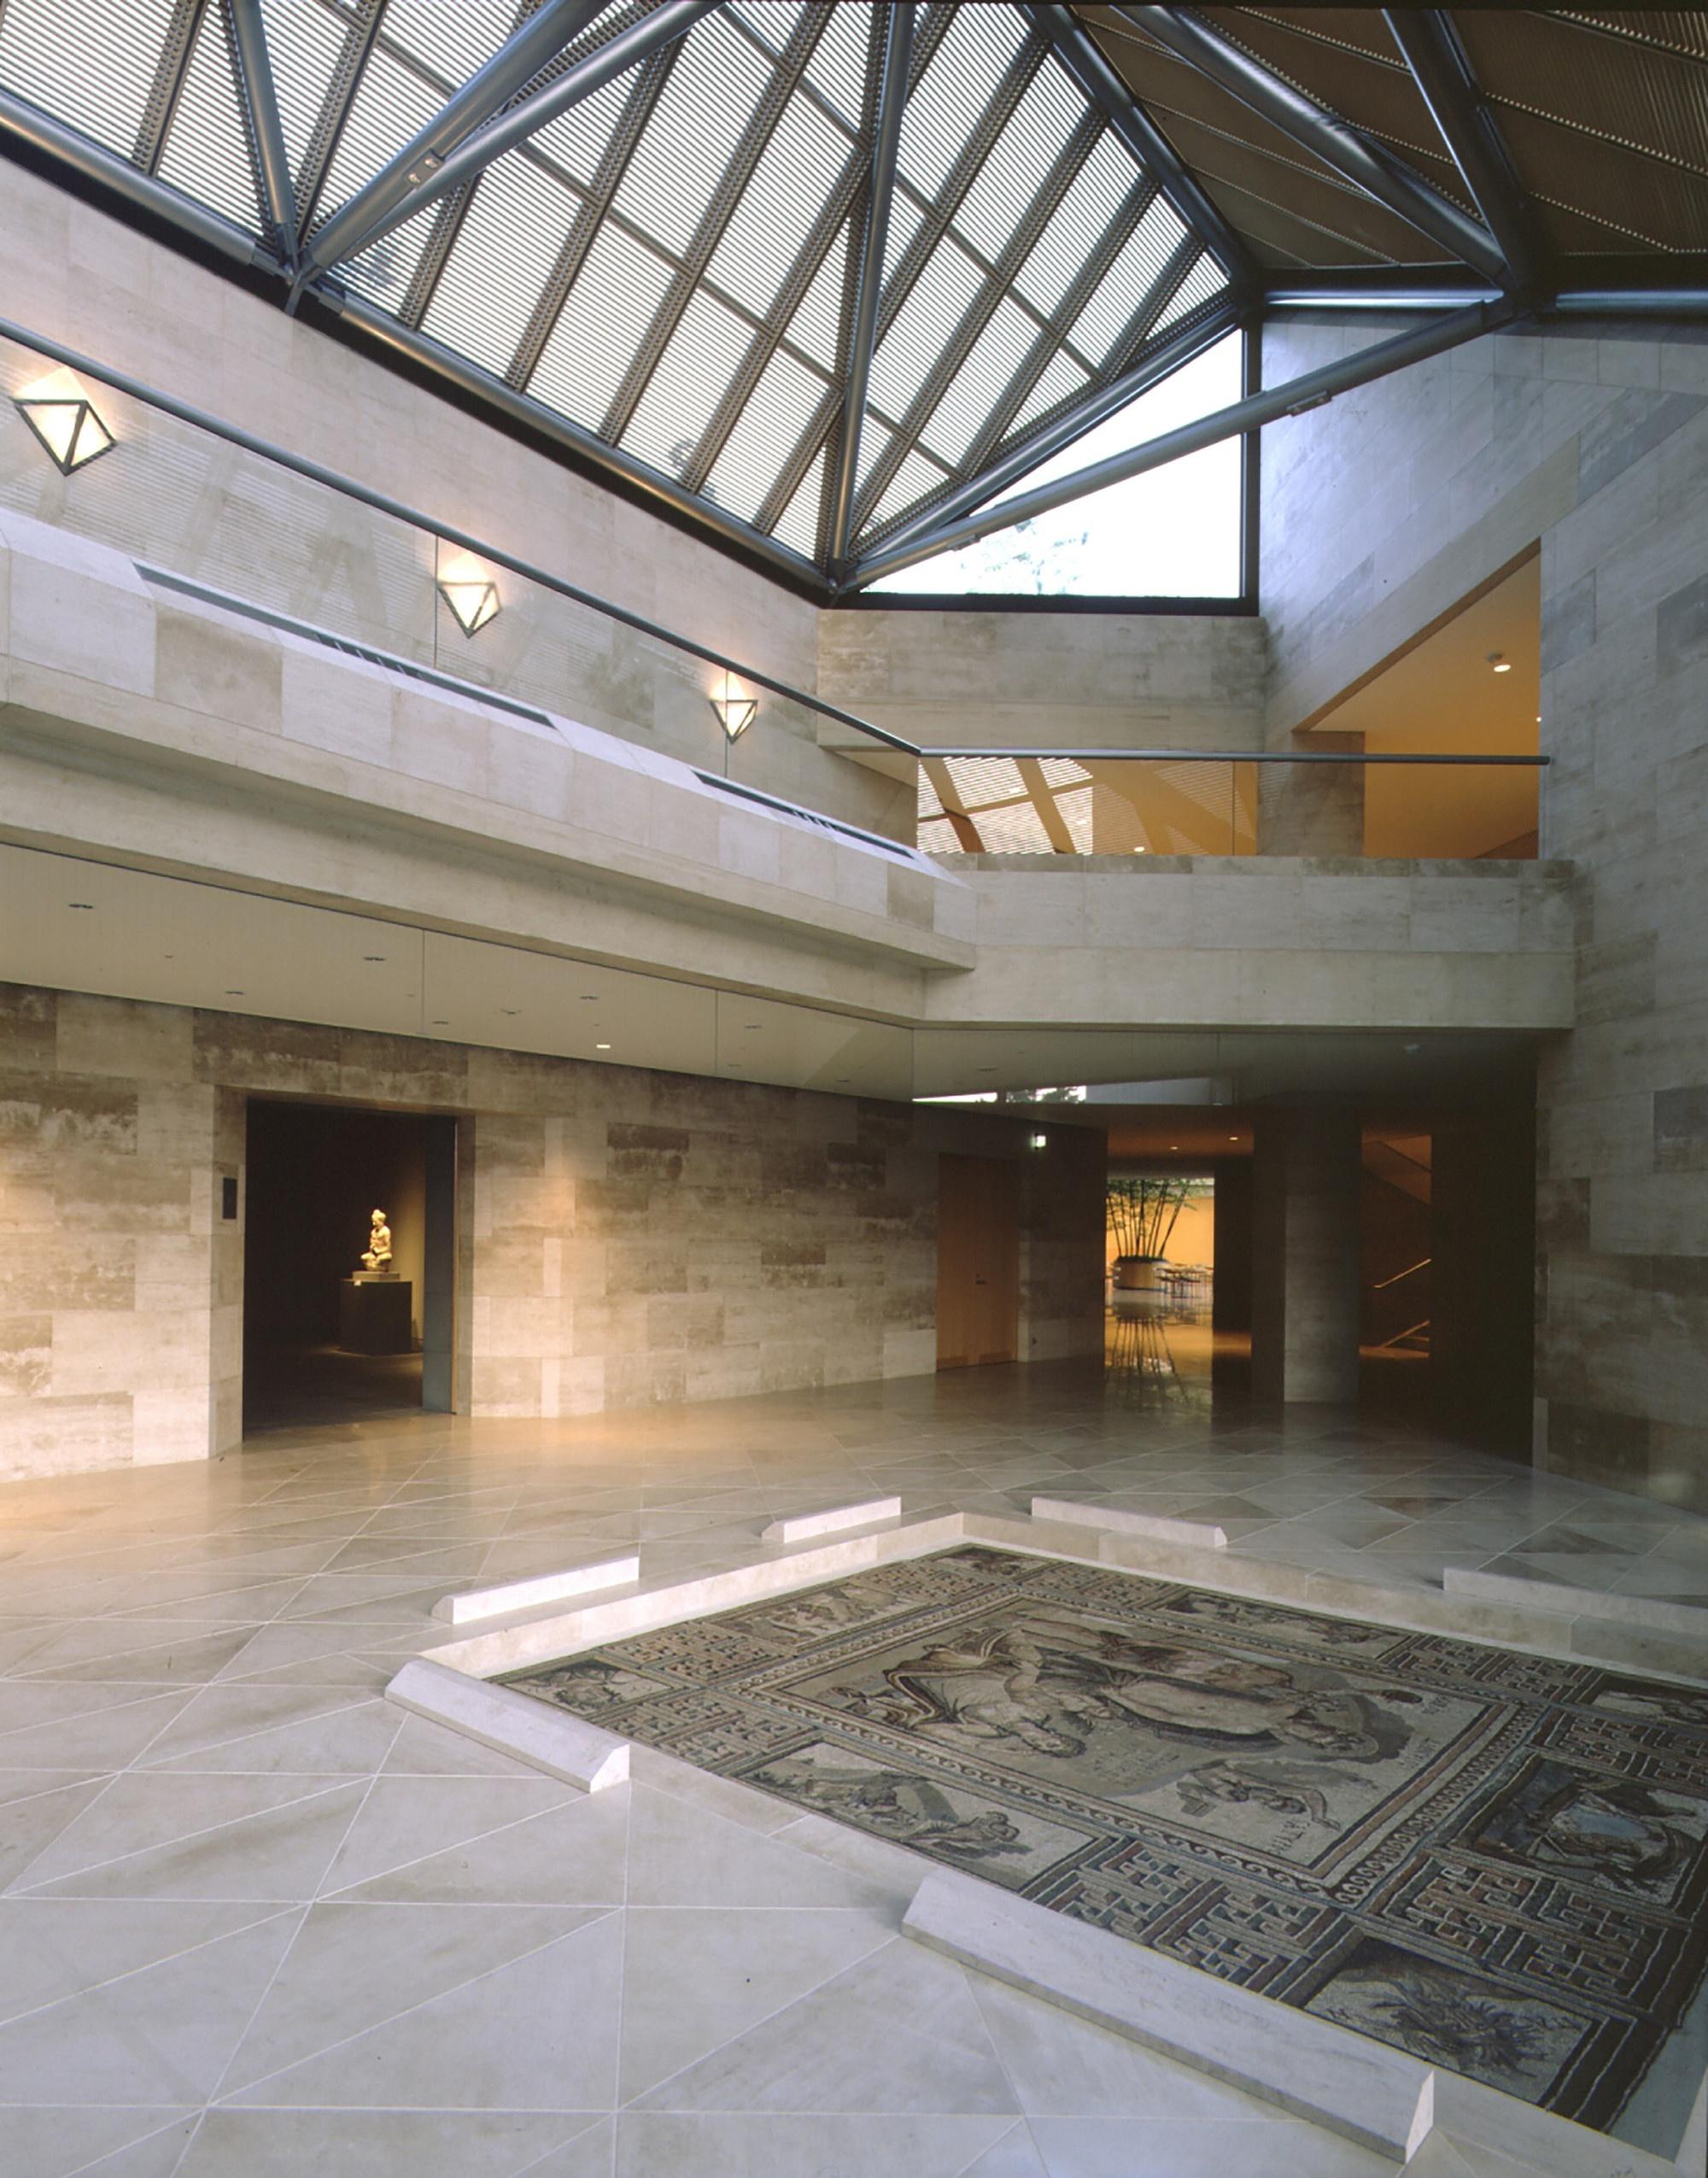 mihomuseum3